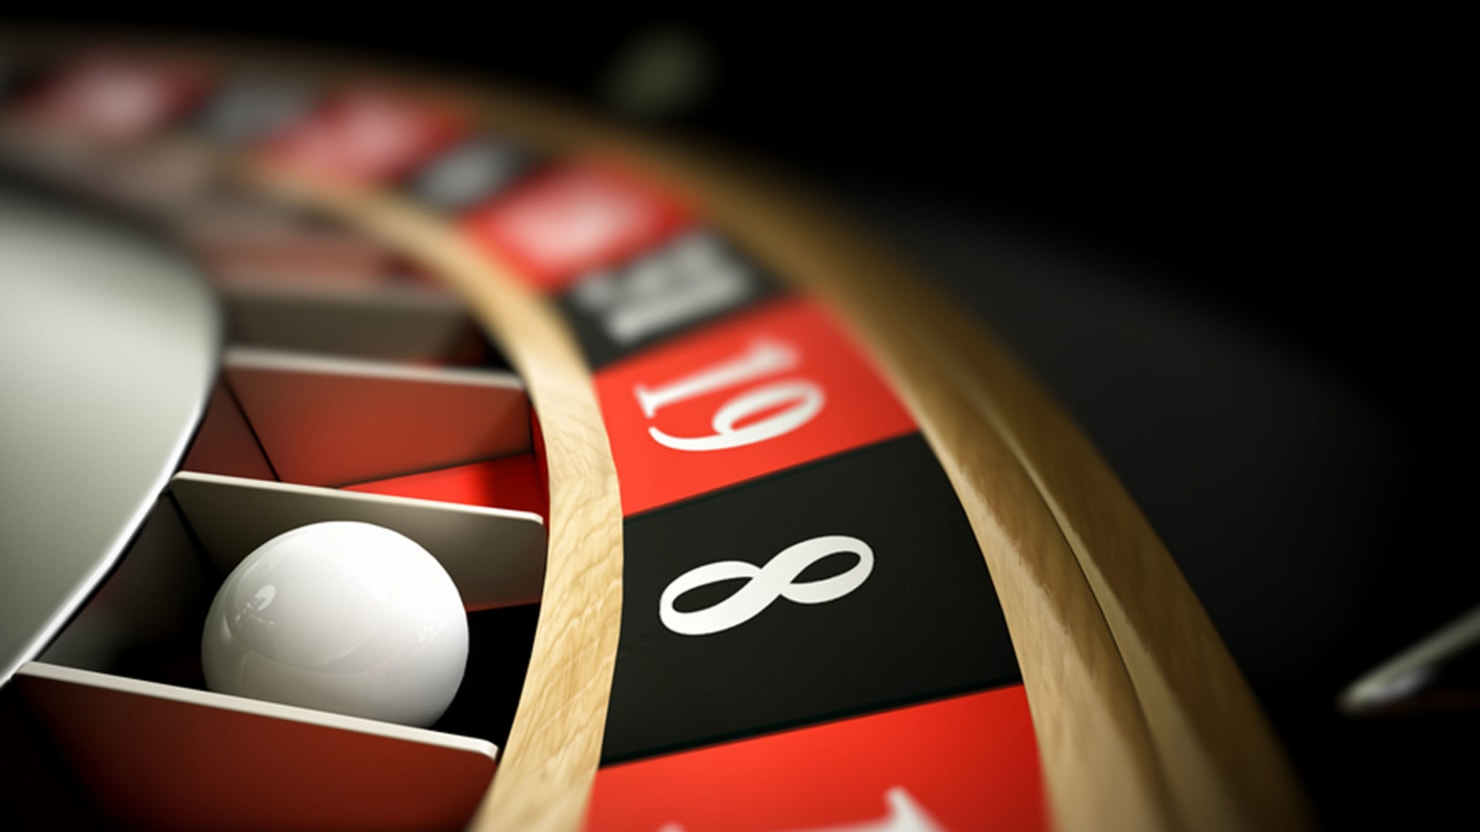 Off shore gambling online pokerguide casino pokersits ladbrokes